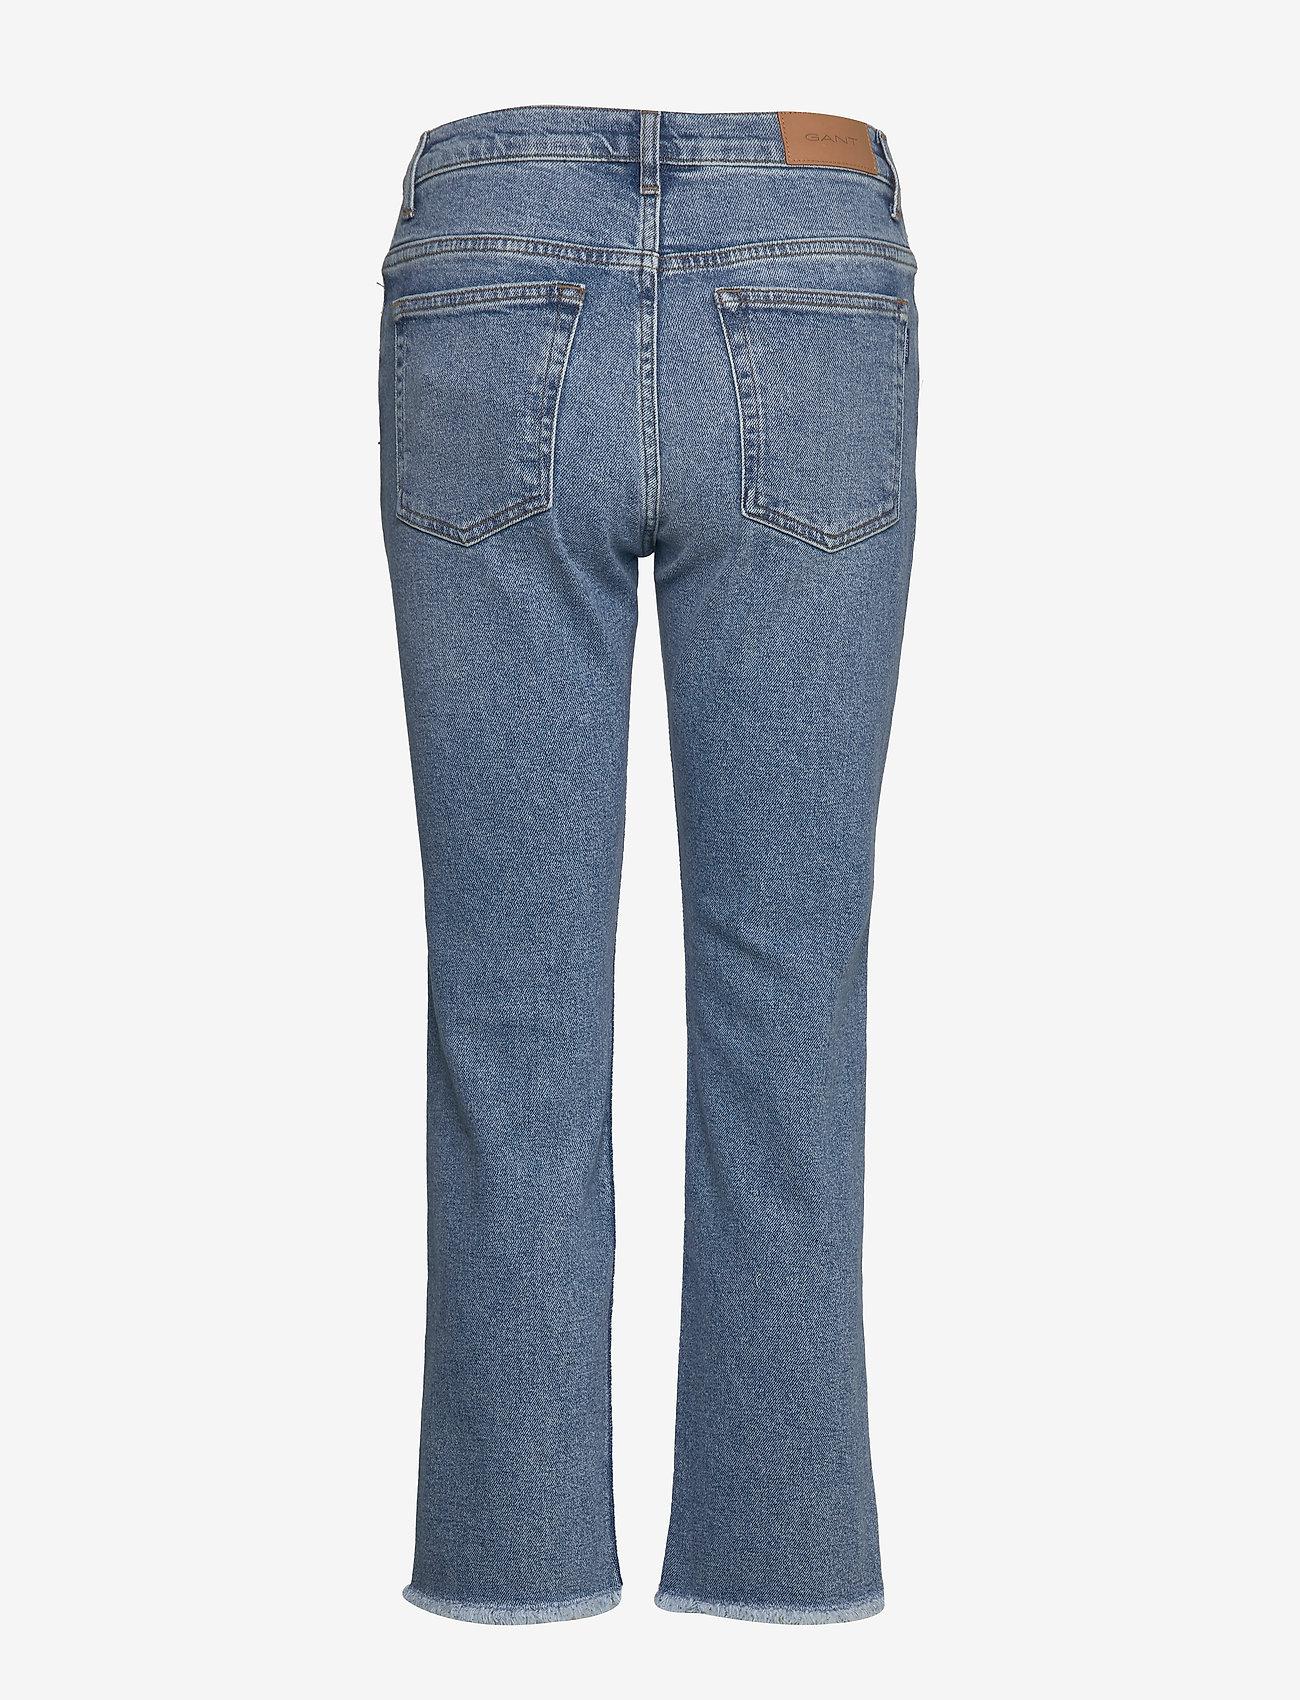 Gant D1. Cropped Authentic Jeans - Light Blue Broken In